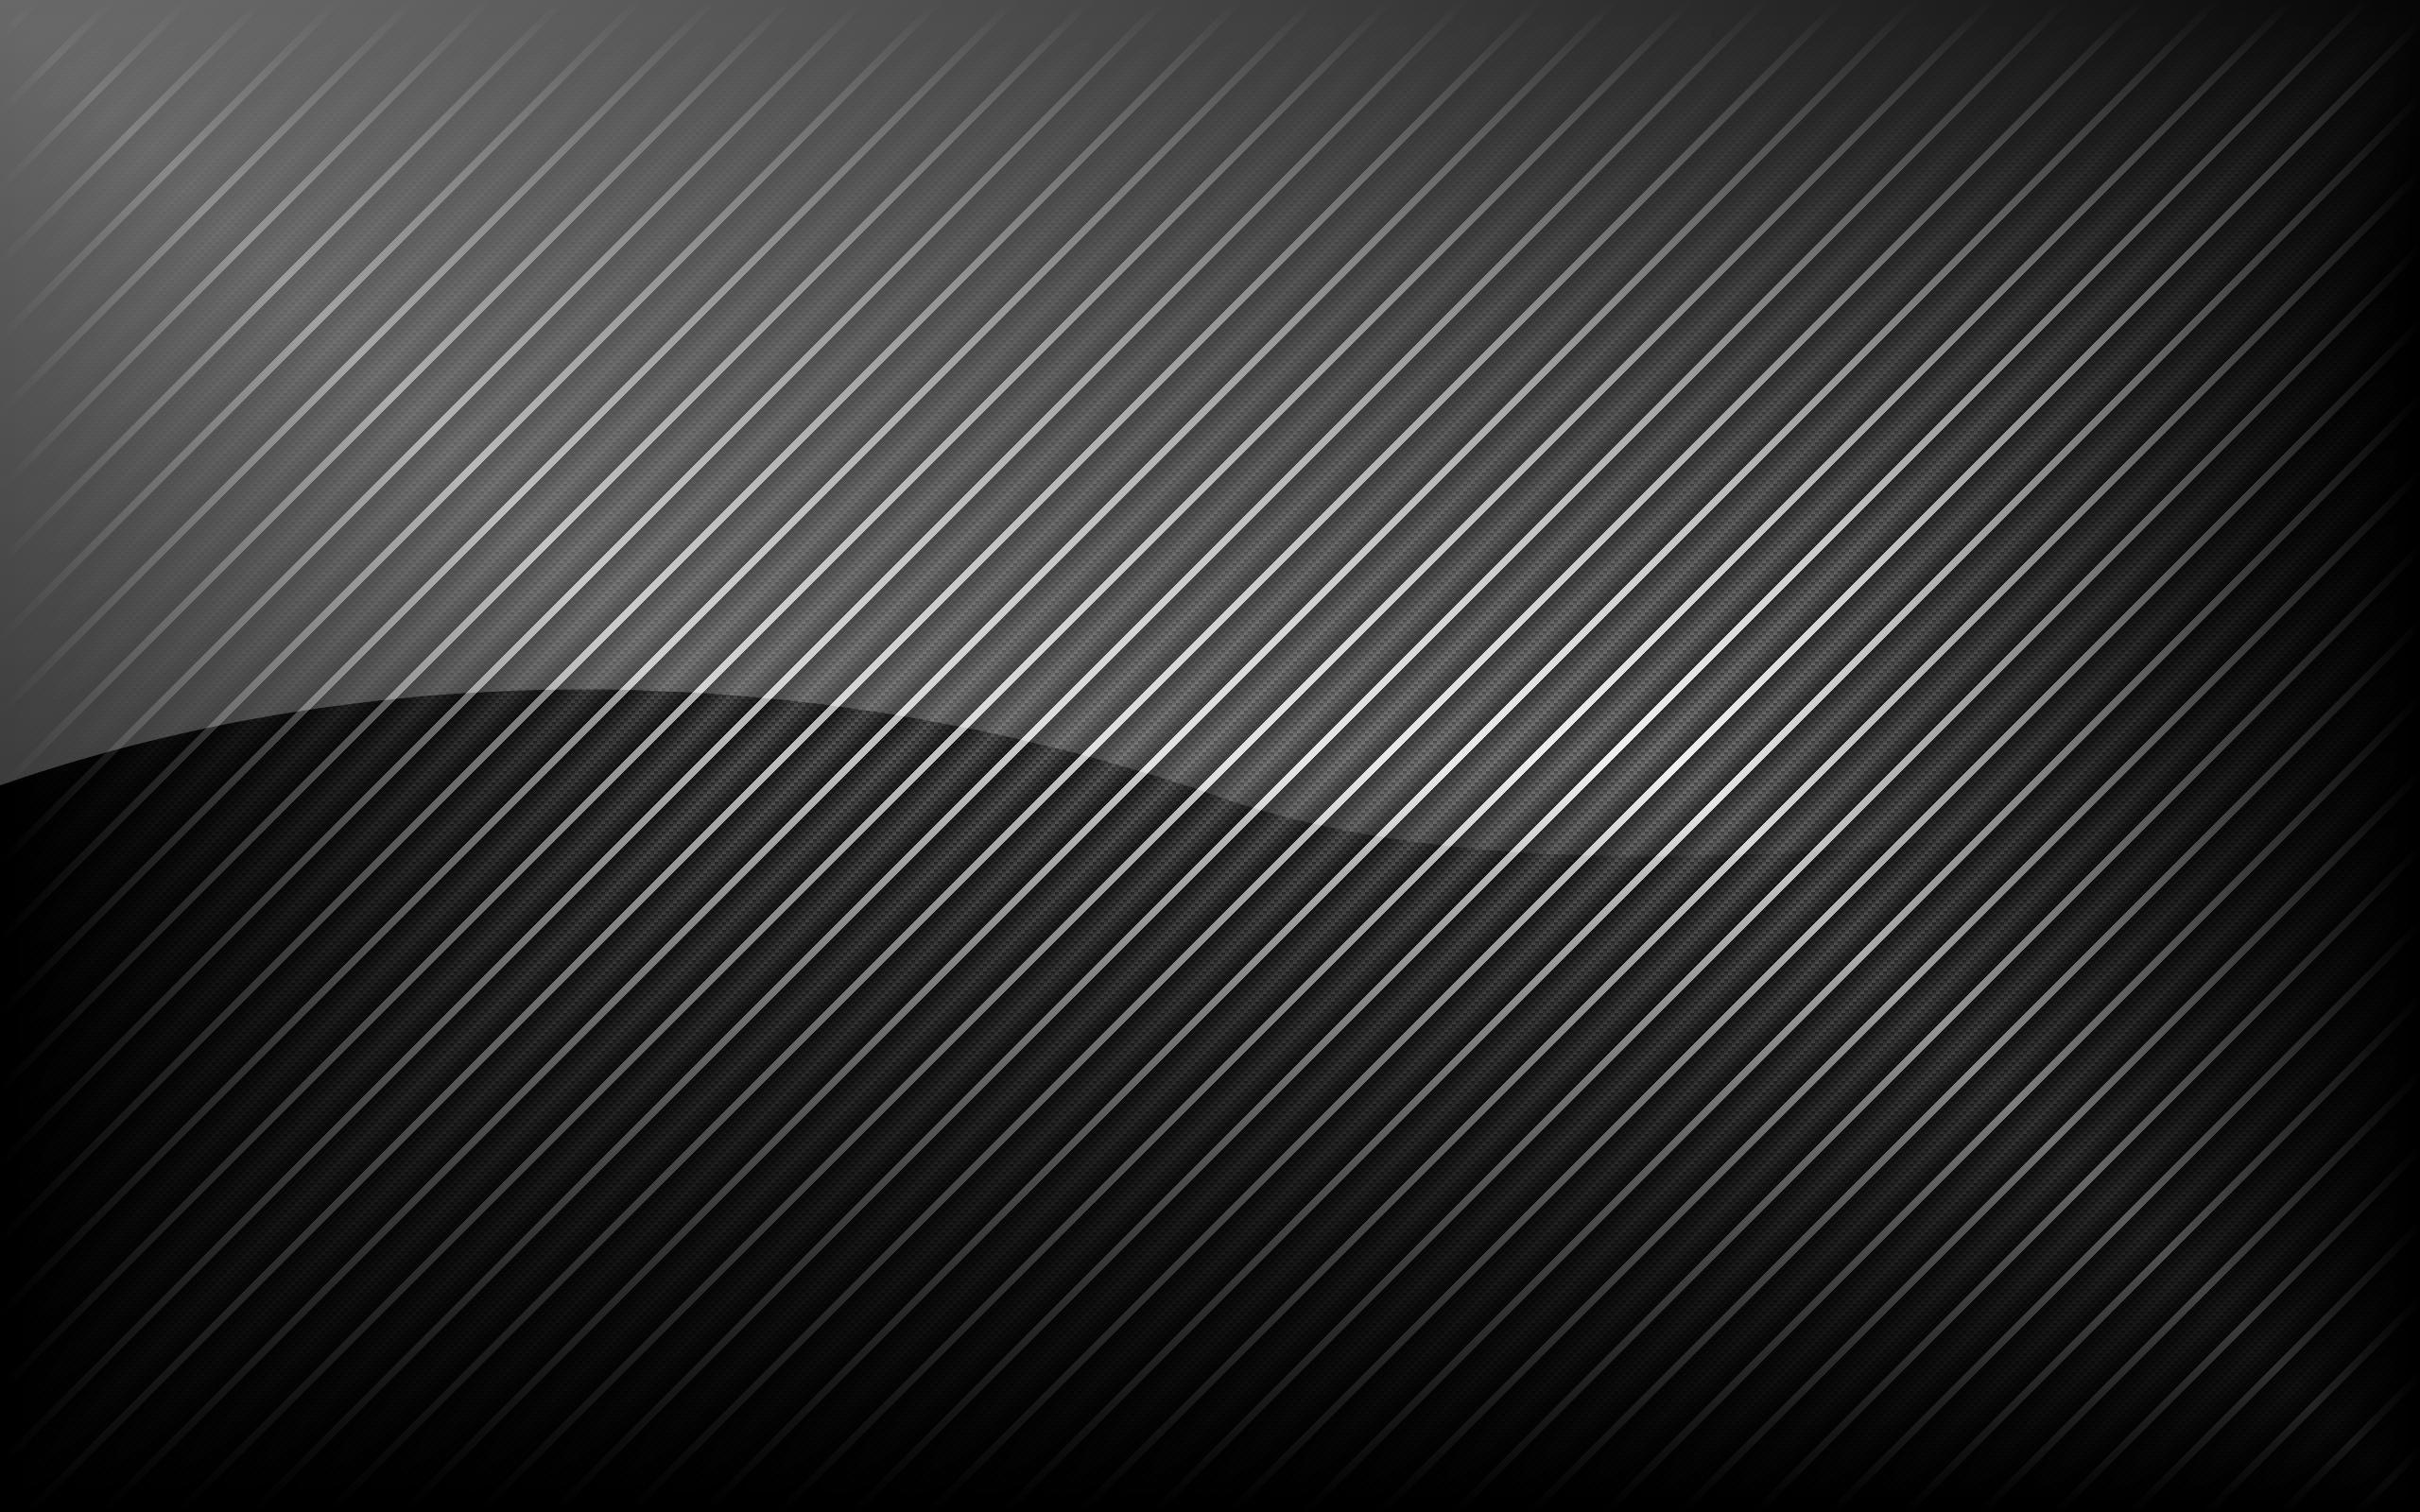 carbon fiber background hd